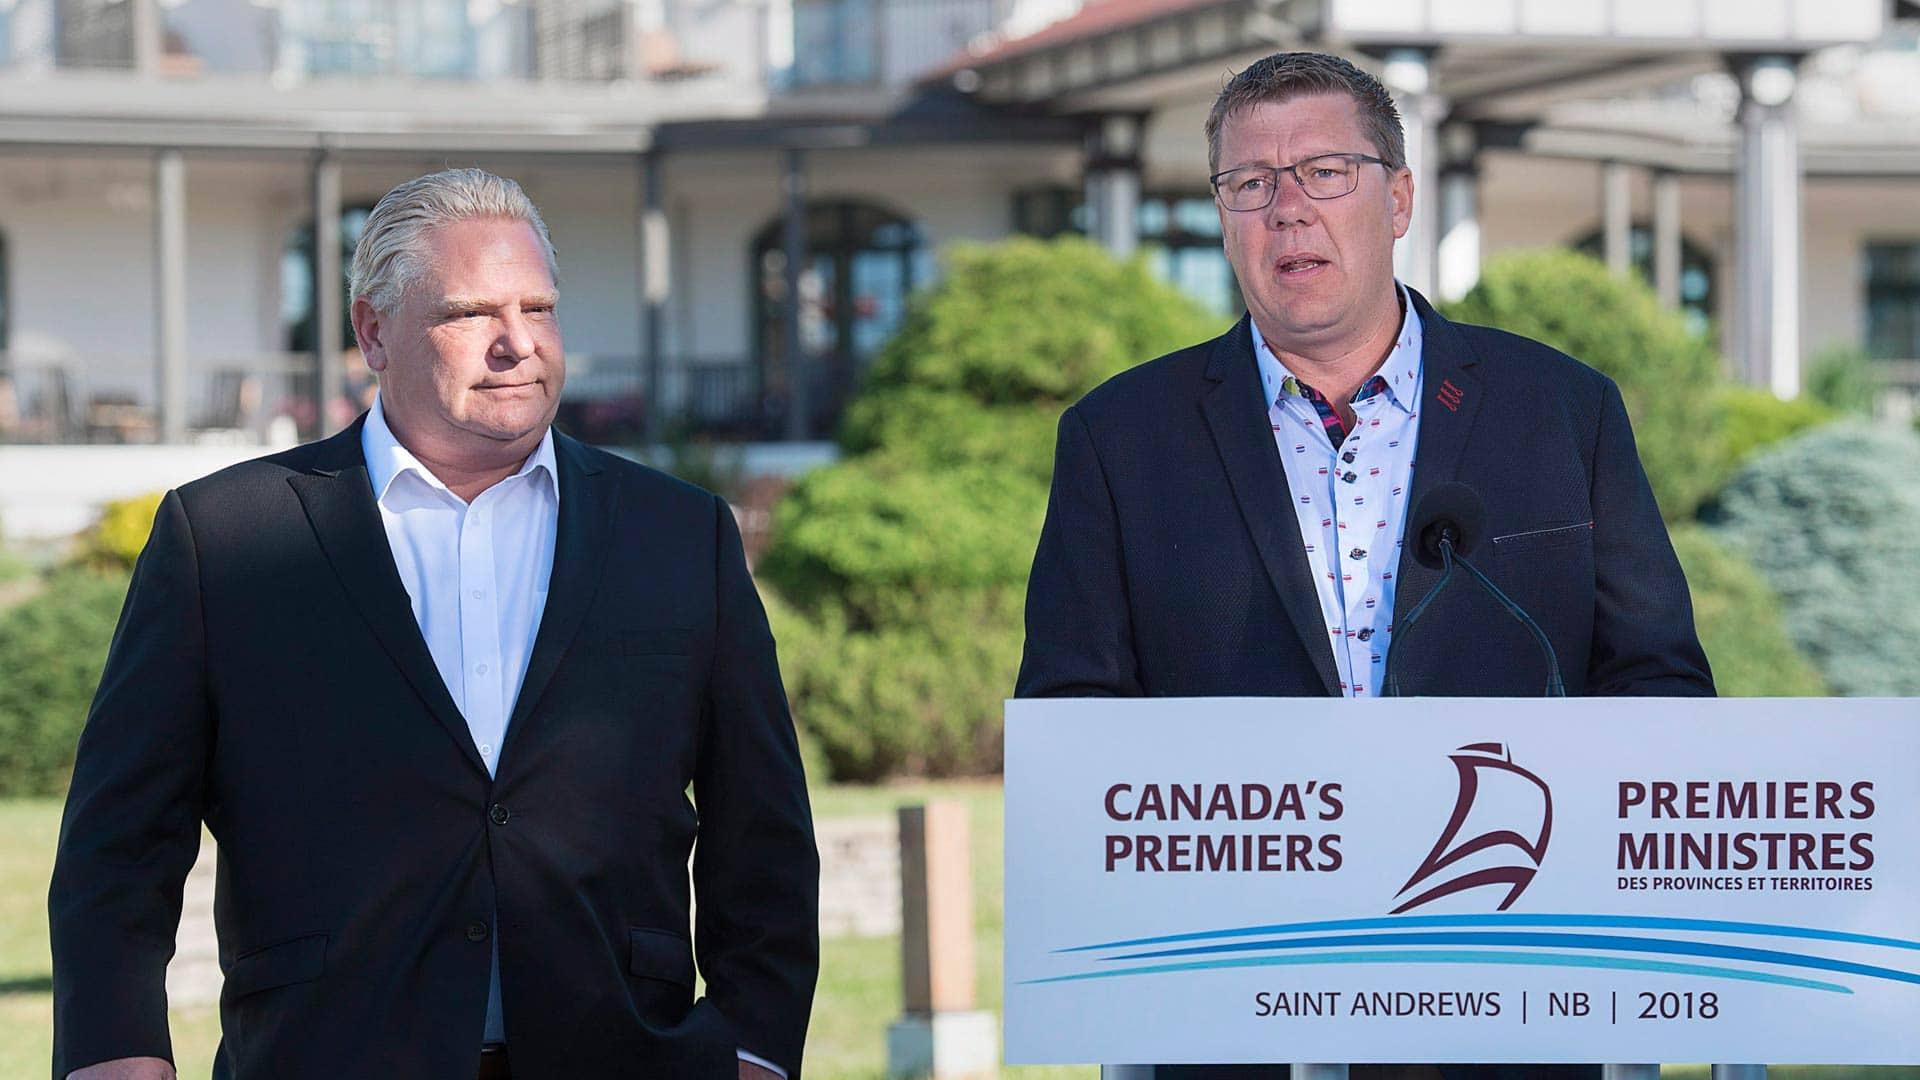 Carbon tax fight intensifies as Ontario joins Saskatchewan in opposition